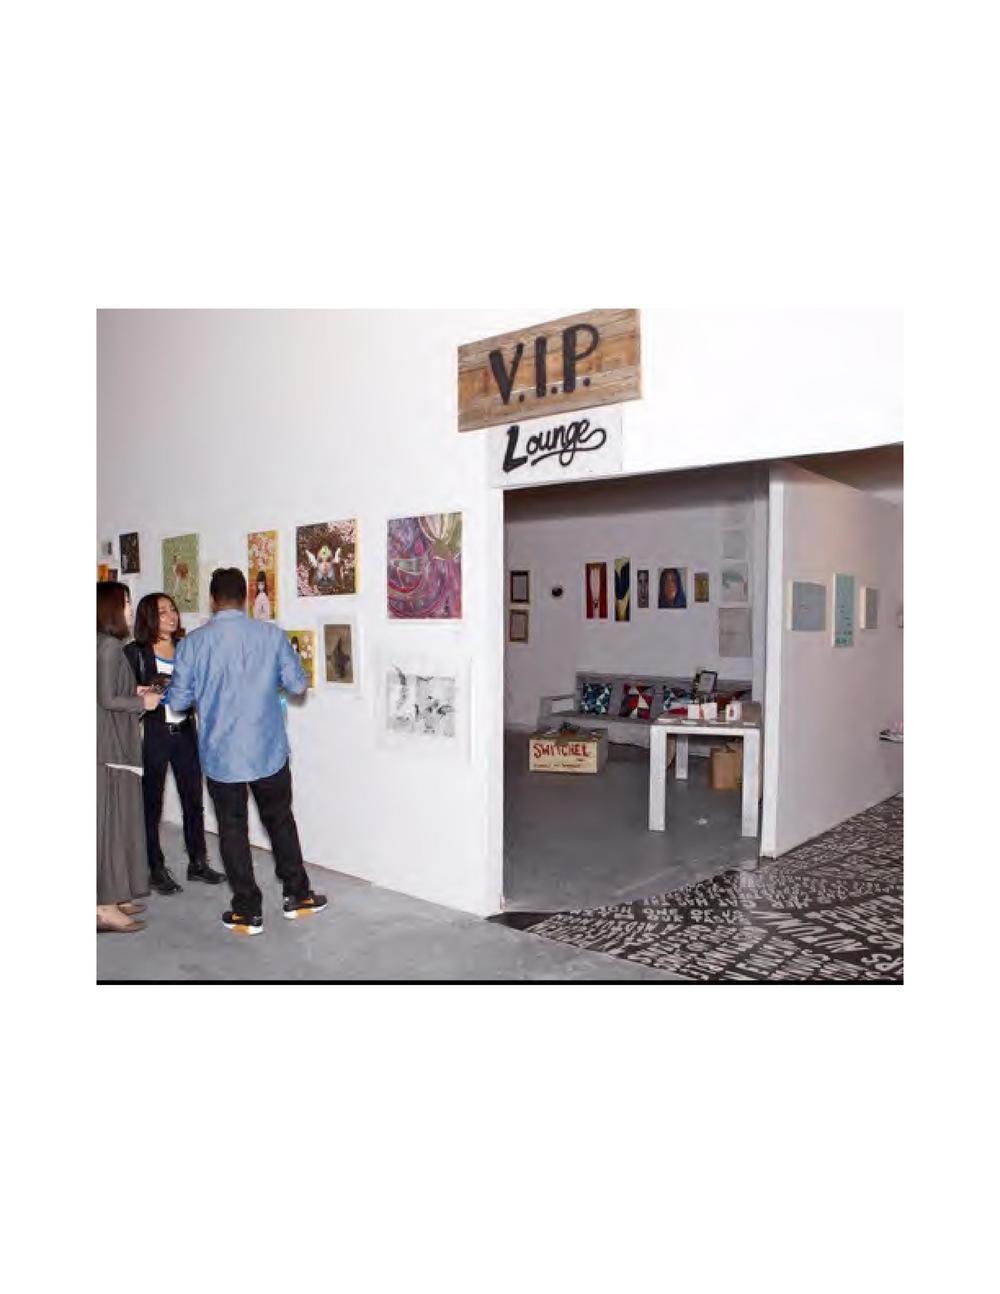 Miami_Art_Basel_Photographs-web-page-024.jpg